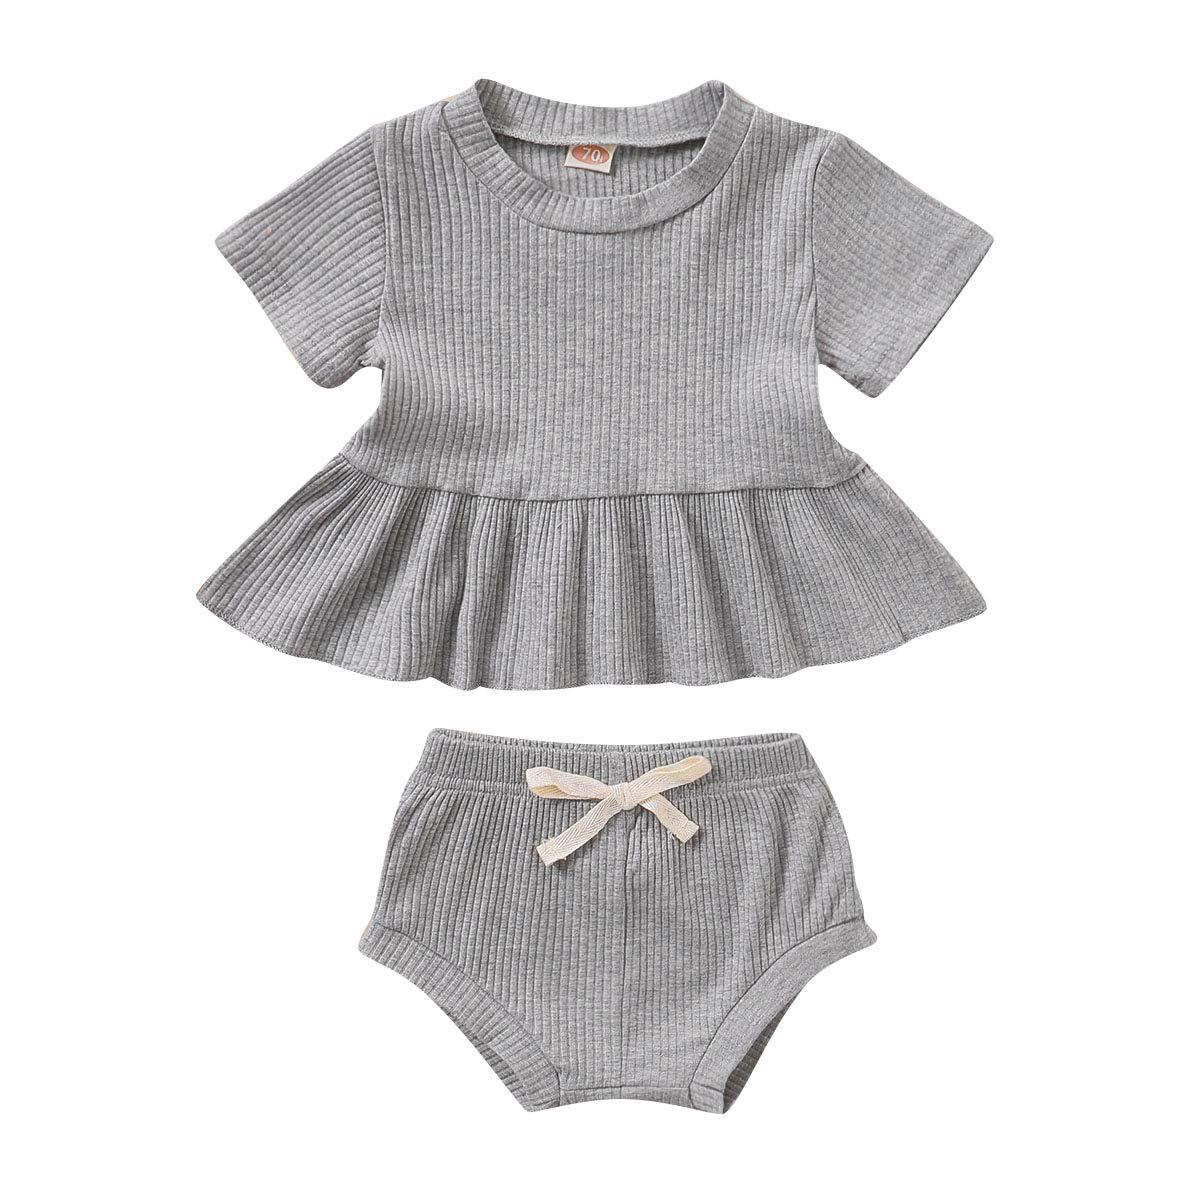 Toddler Baby Girl Short Sets Solid Color Short Sleeve Top Dress+Shorts Infant Kids Clothes Outfits Summer